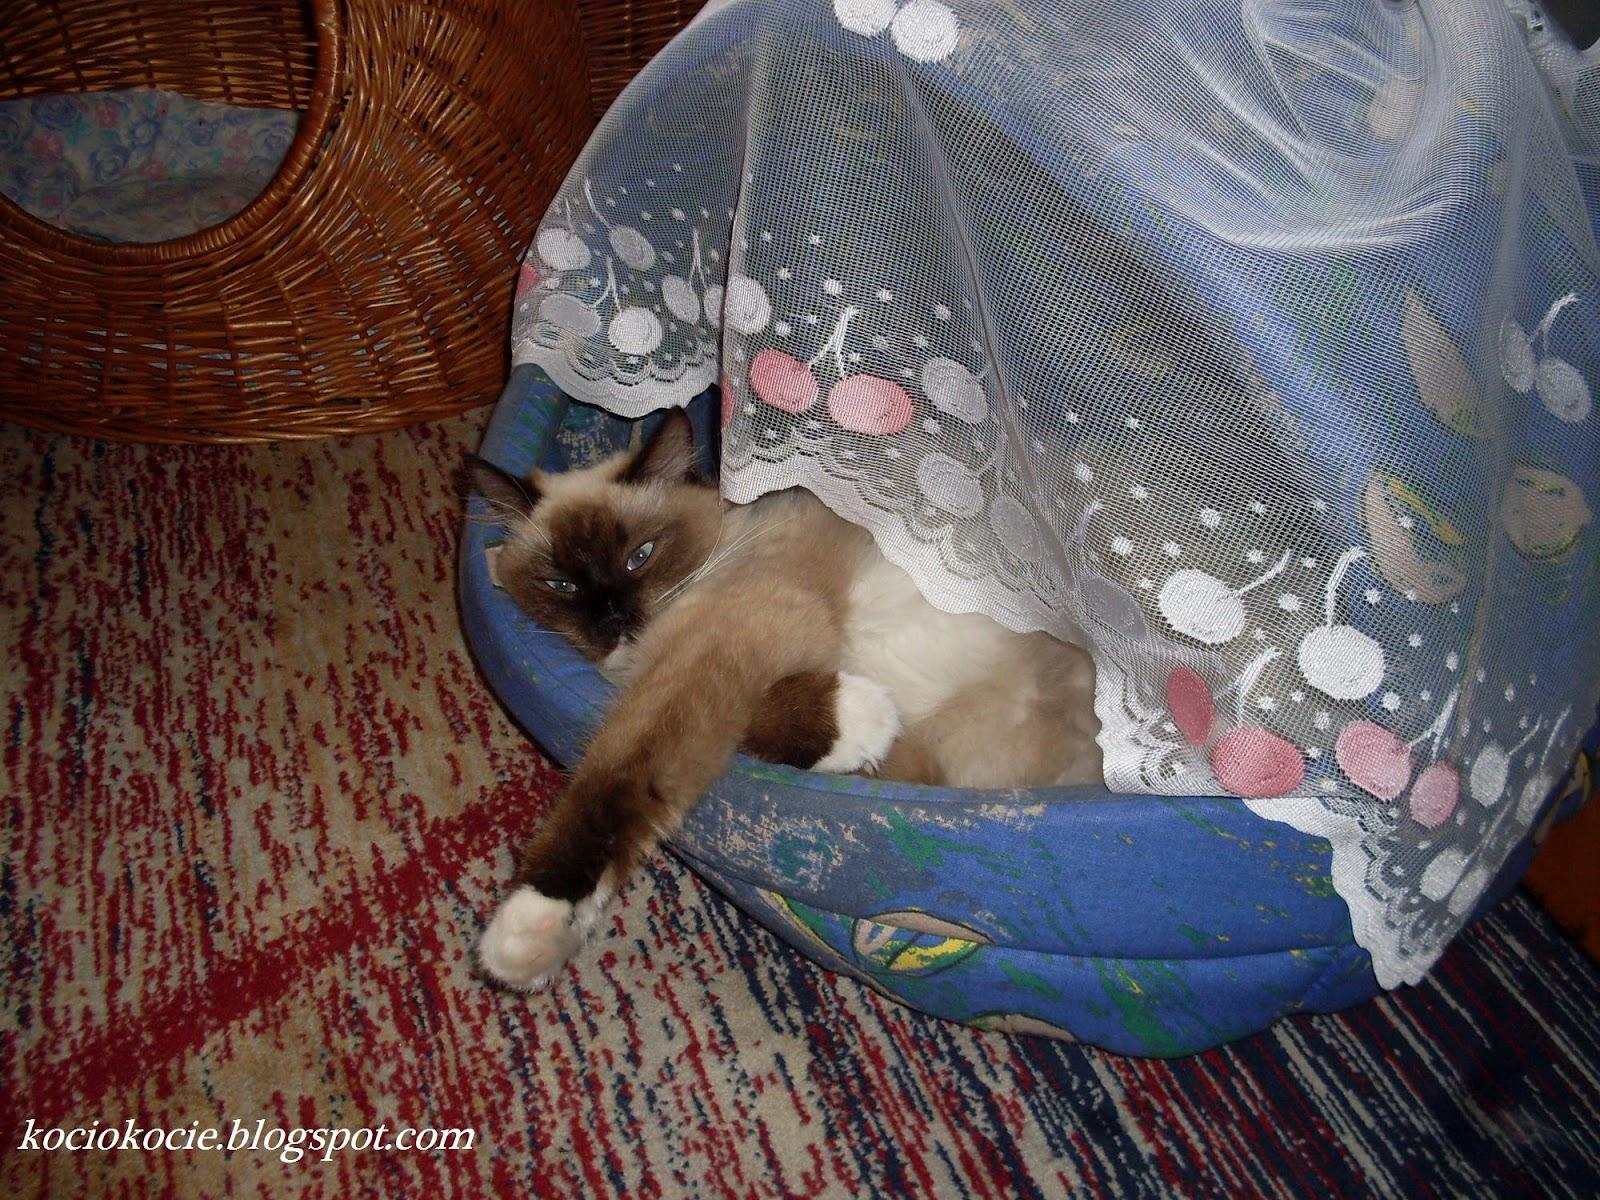 Koci Blog Gdzie śpi Kot